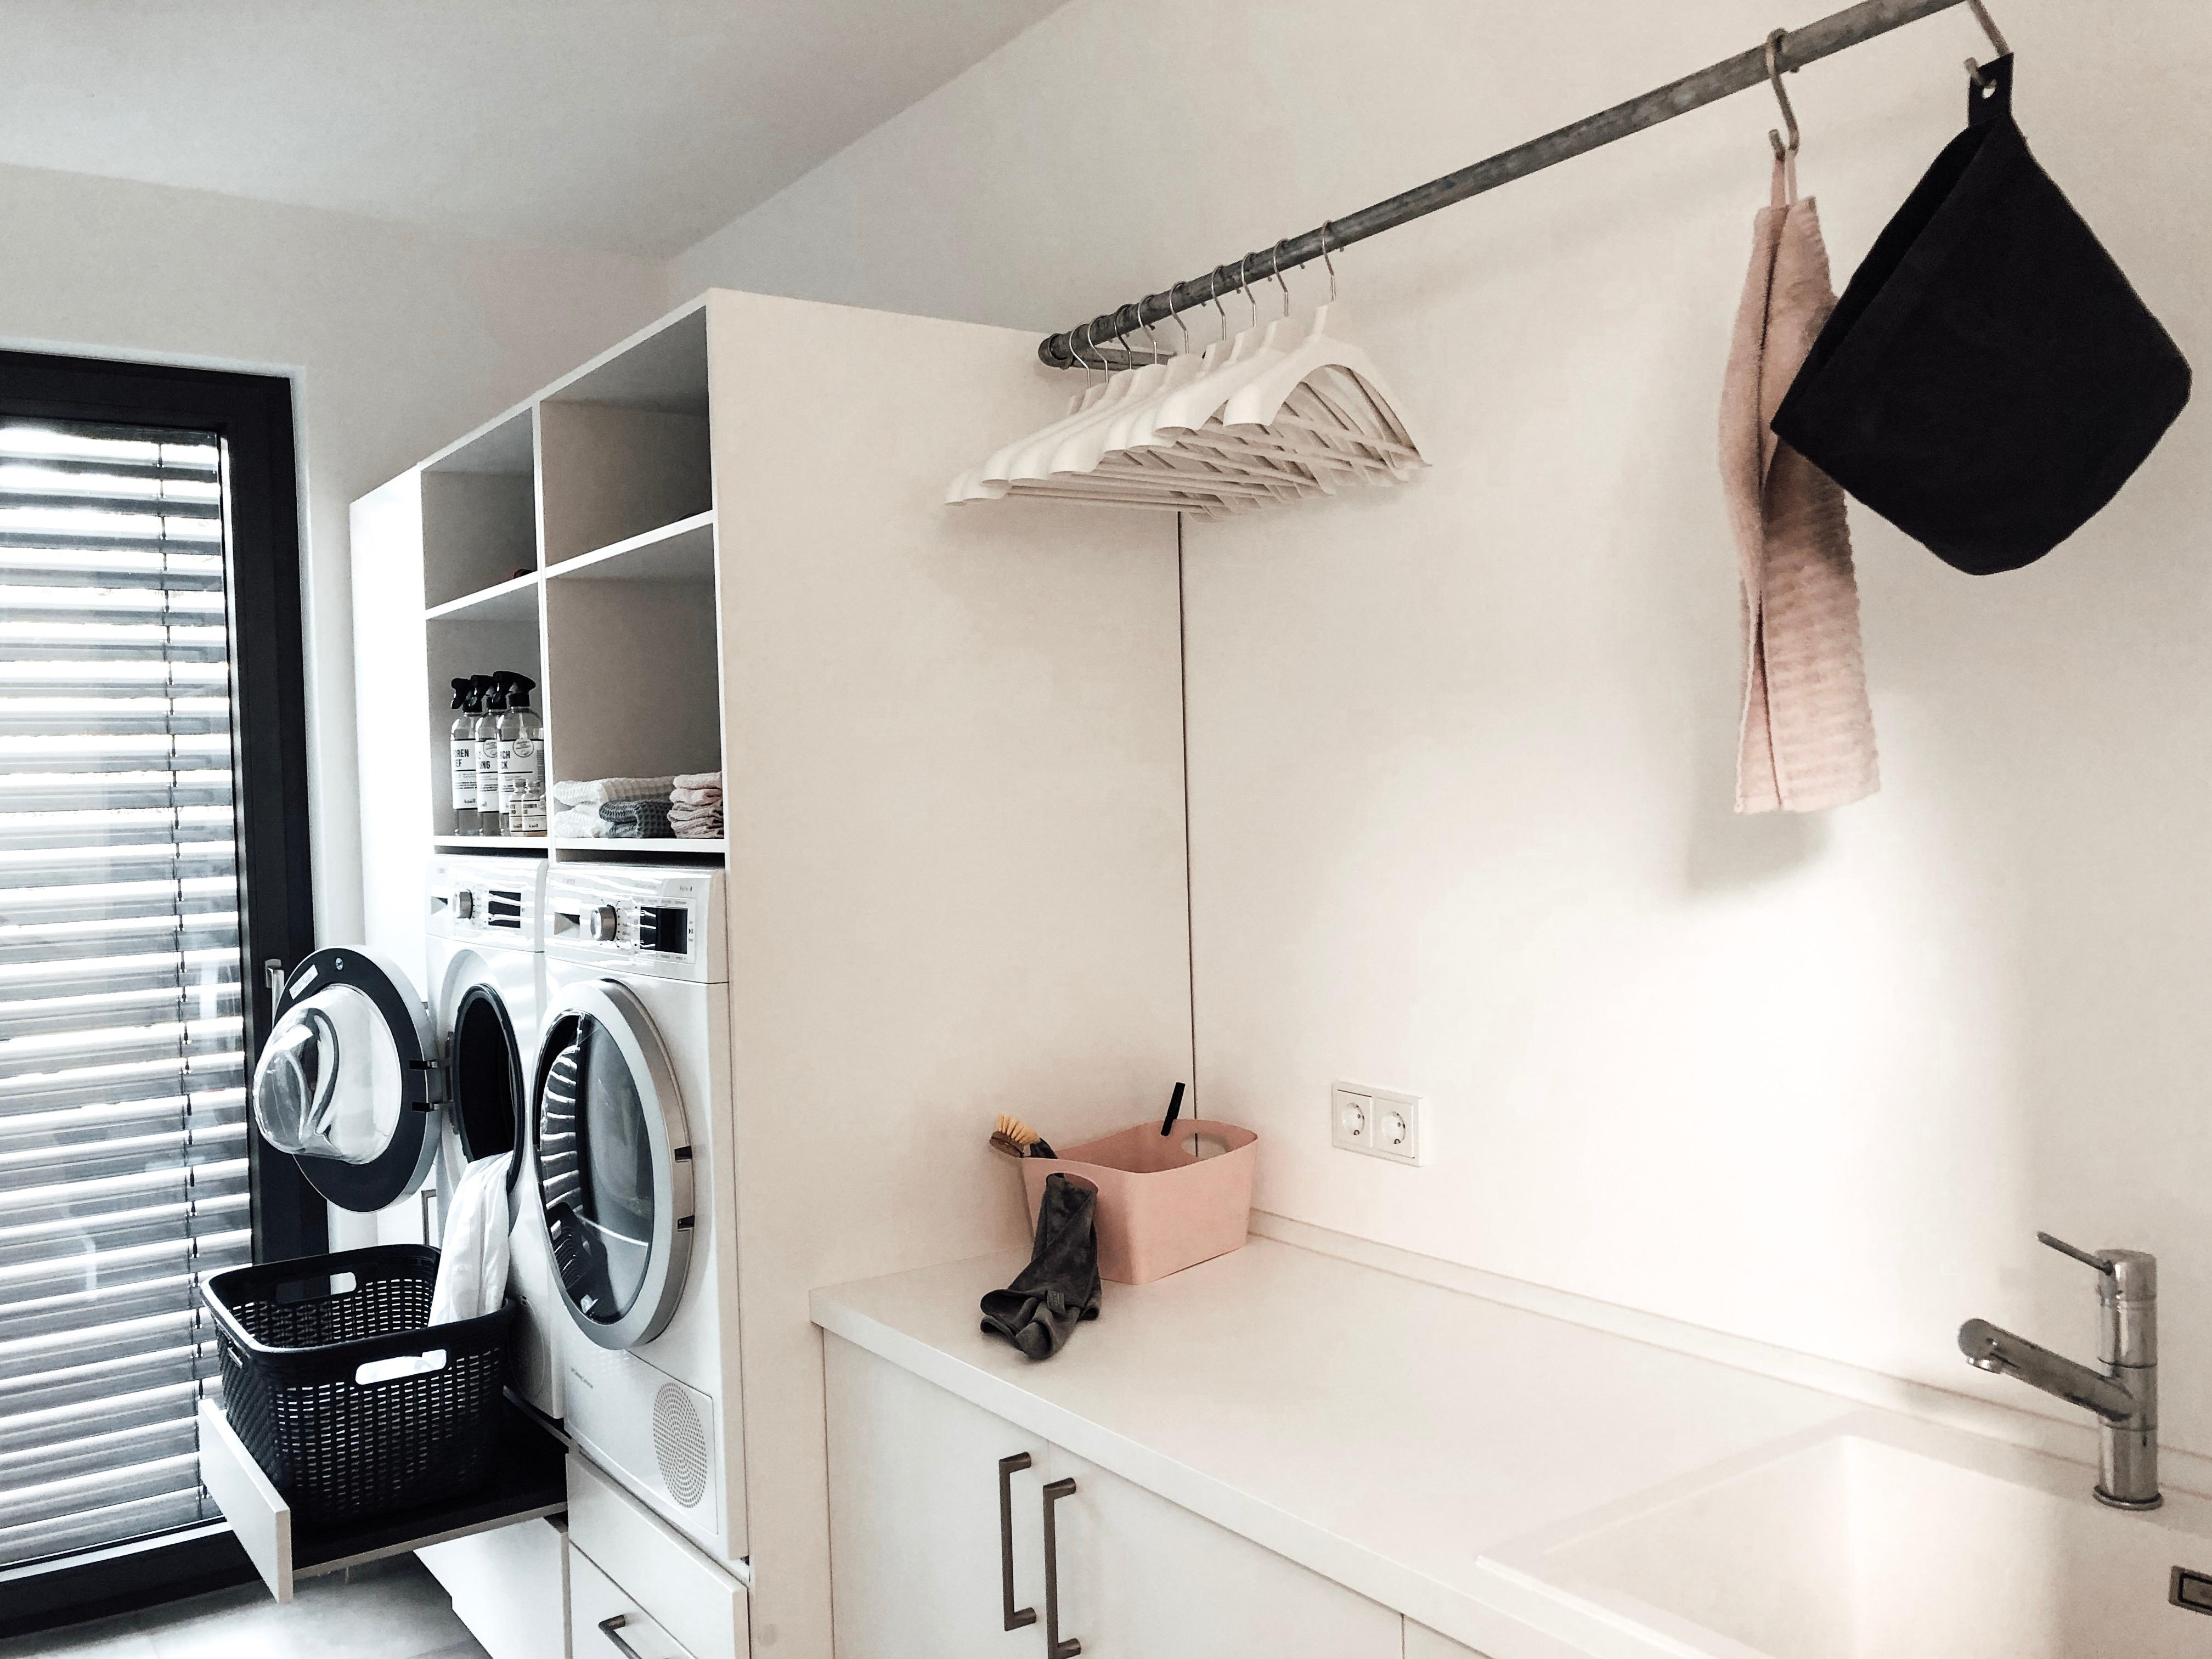 waschmaschinen trockner schrank ikea